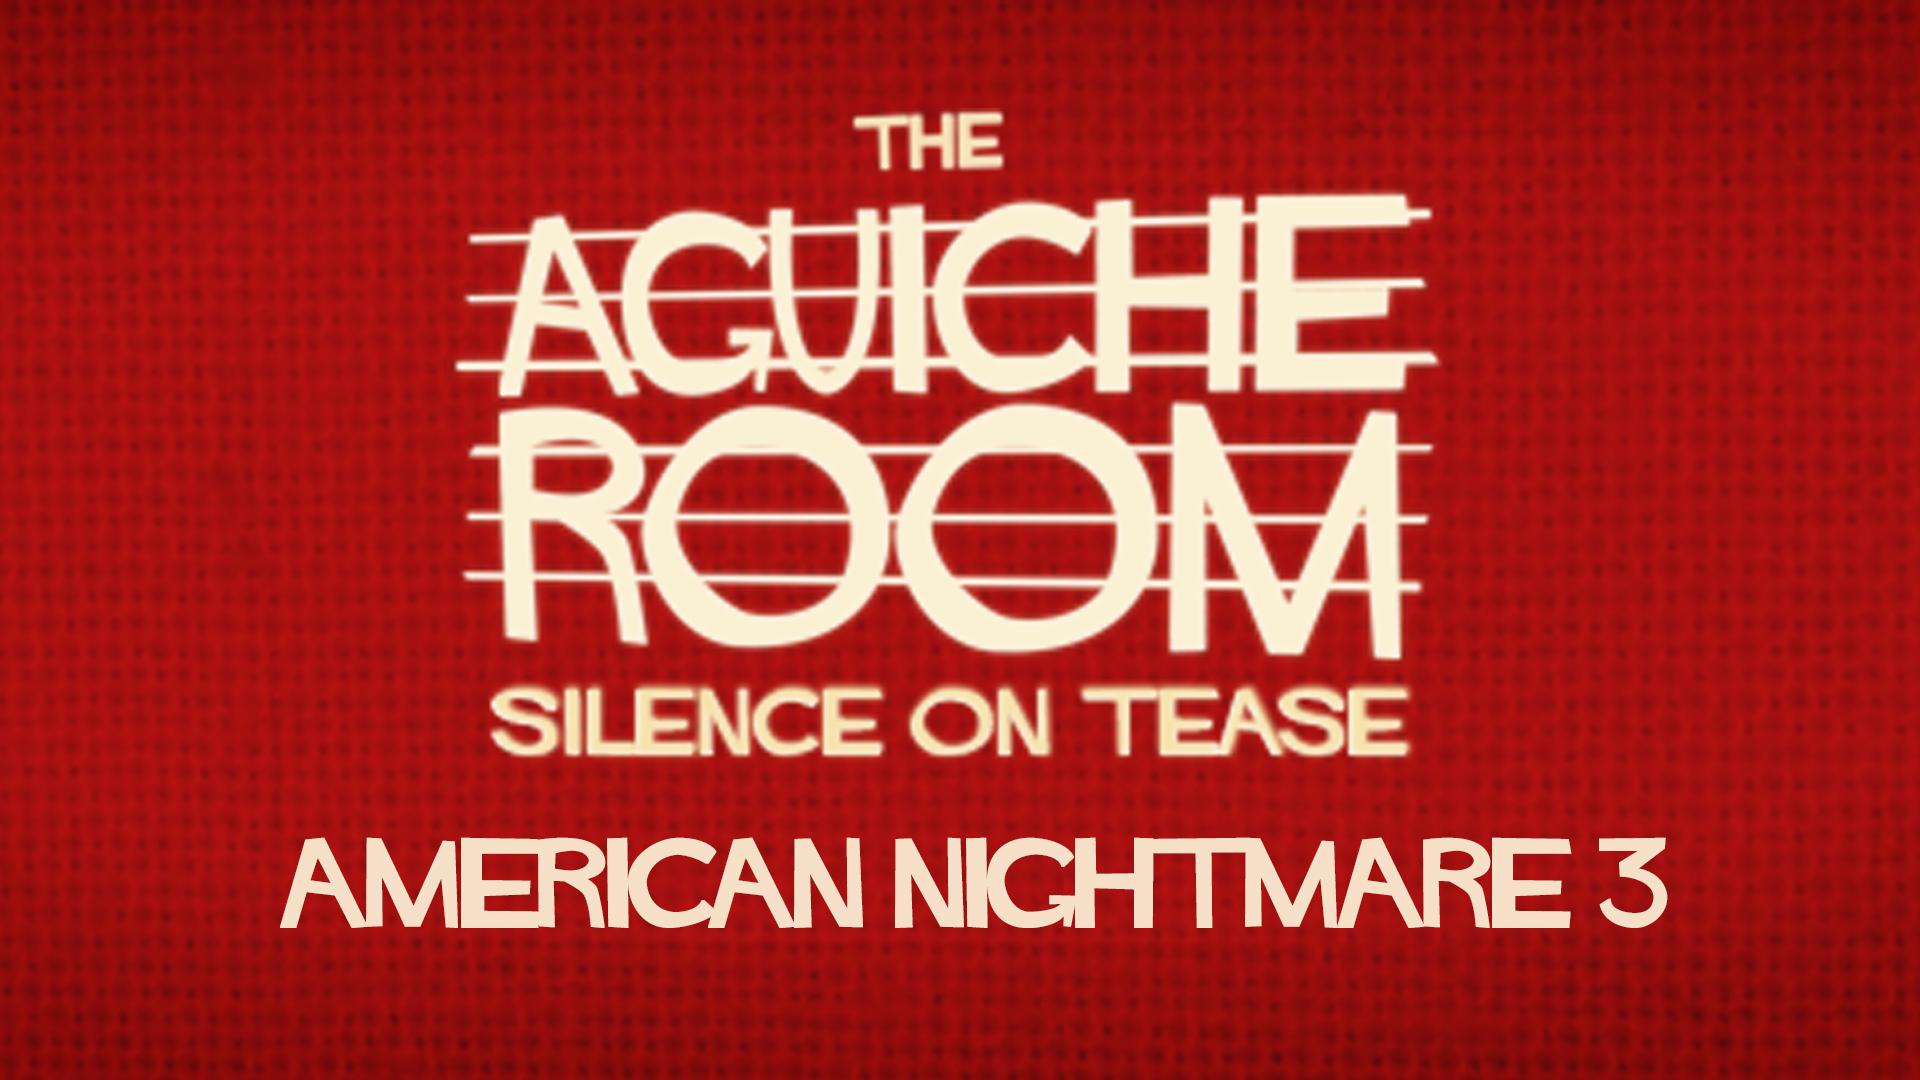 The Aguiche Room : American Nightmare 3